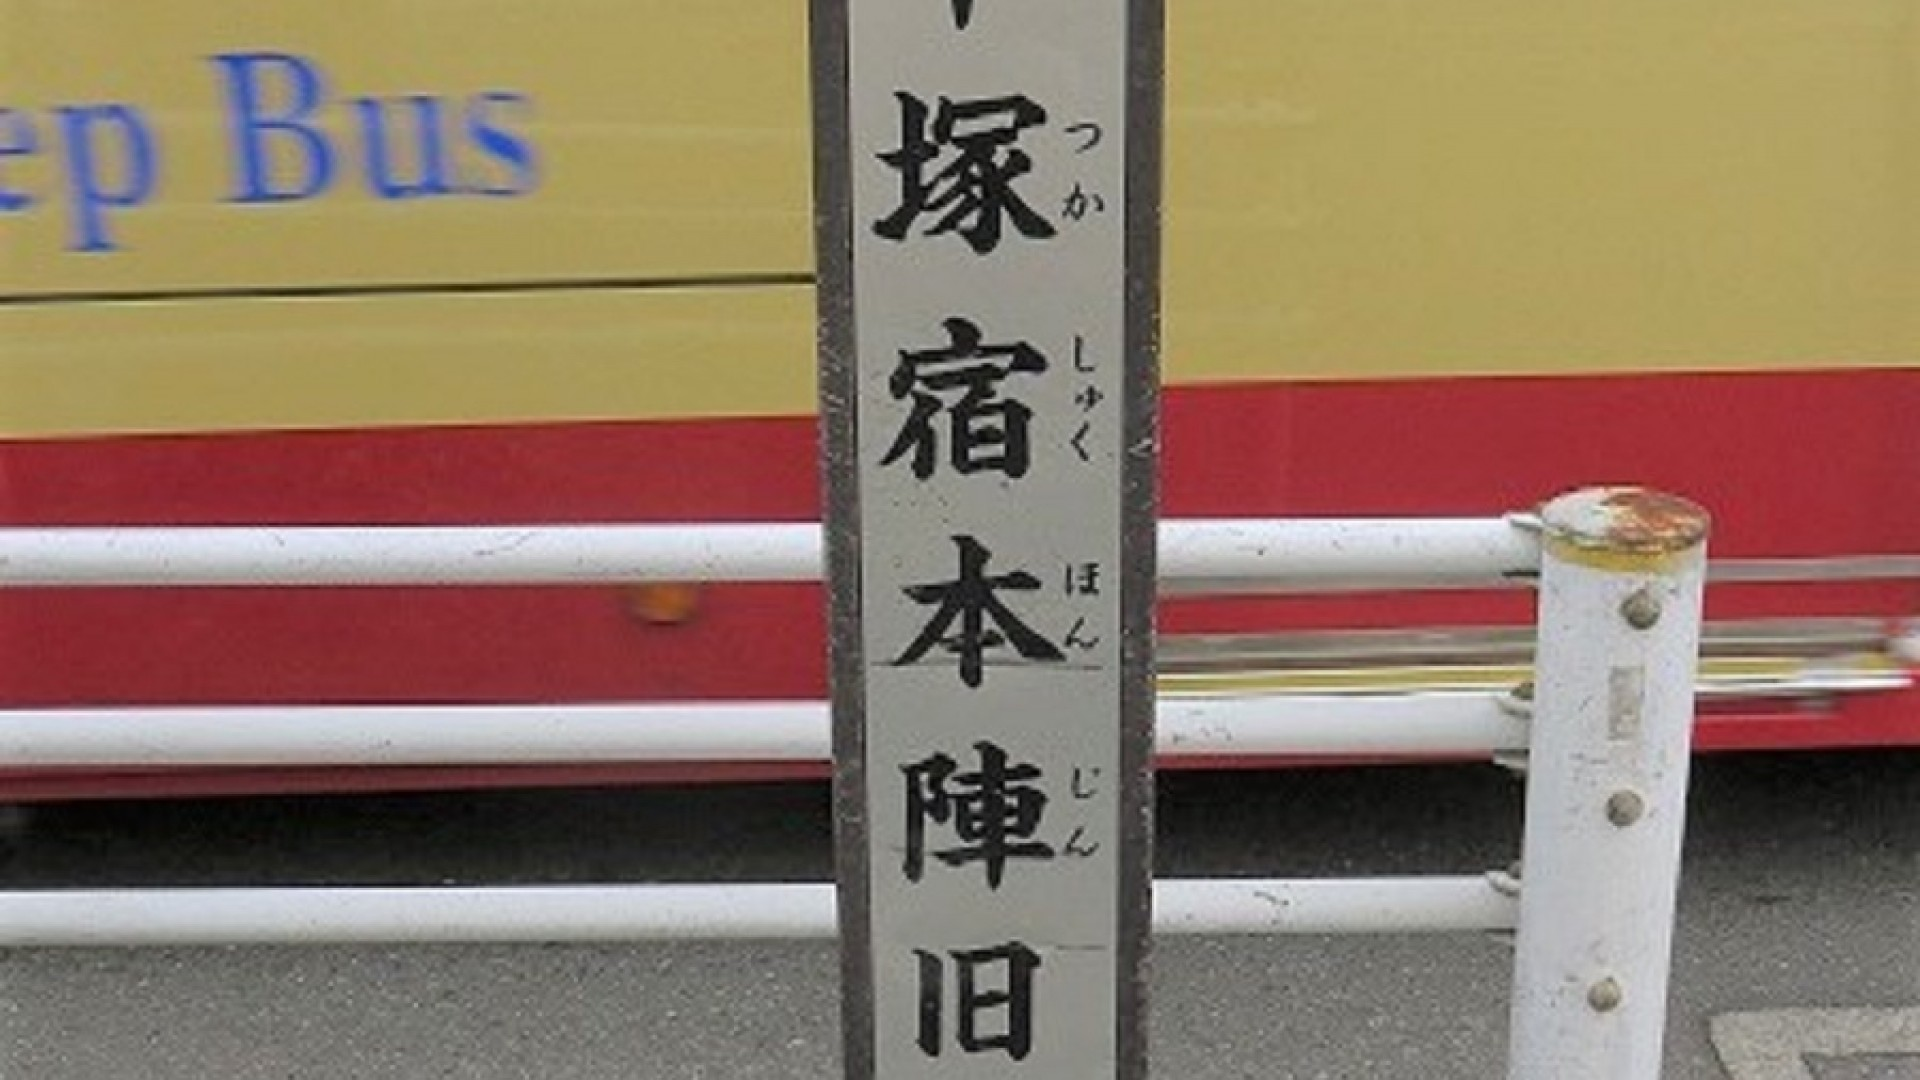 Honjin-kyu (Ehemaliges offizielles Gasthaus)